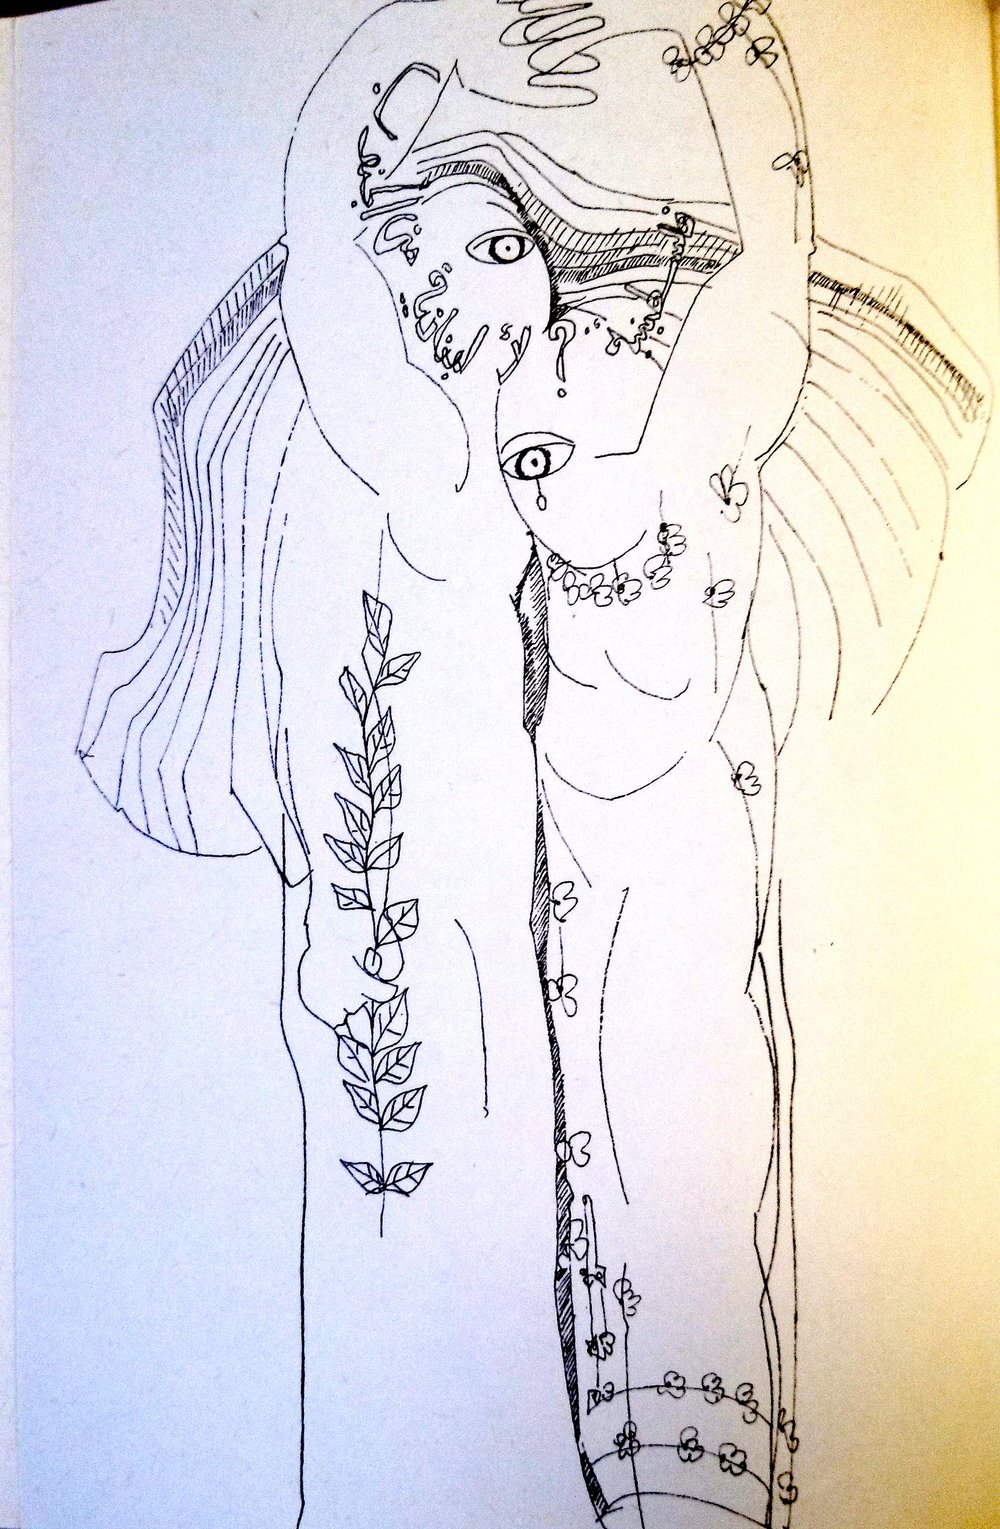 Fourth in a series by Mona Saudi, in Ghassān Kanafānī's  al-Āthār al-kāmilah , Vol. 1 (Beirut: Dār al-Ṭalīʿah, 1972).